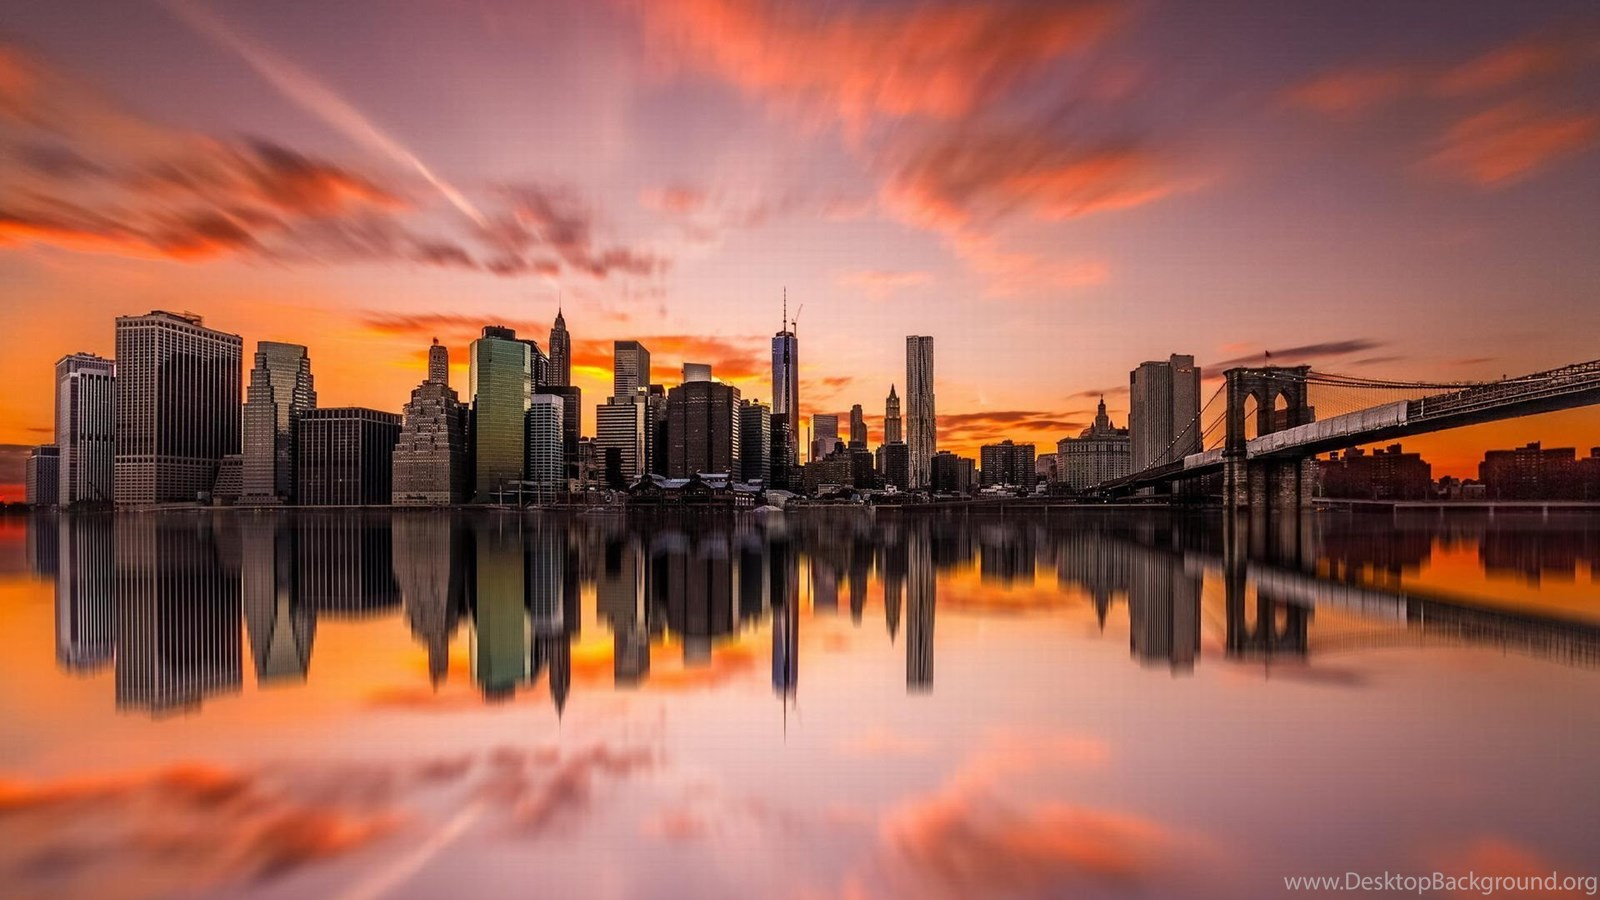 New York City Wallpapers Hd Download For Desktop And Mobile Desktop Background